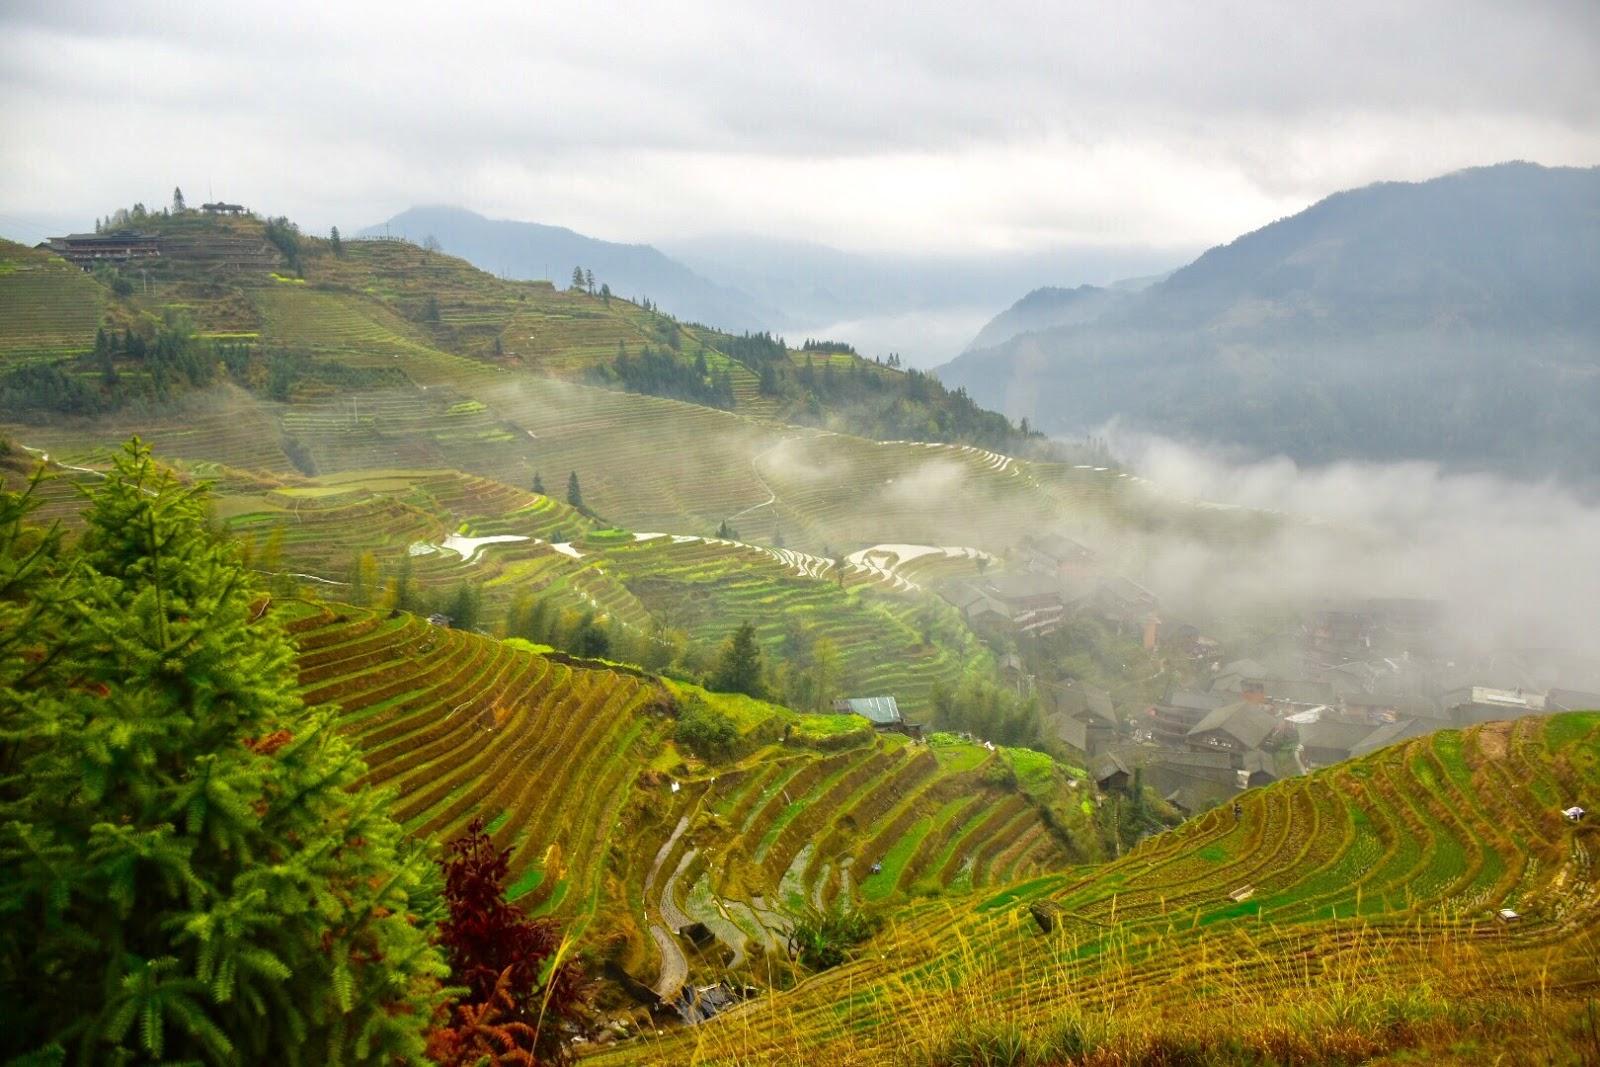 Longji Rice Terrace Scenic Spot